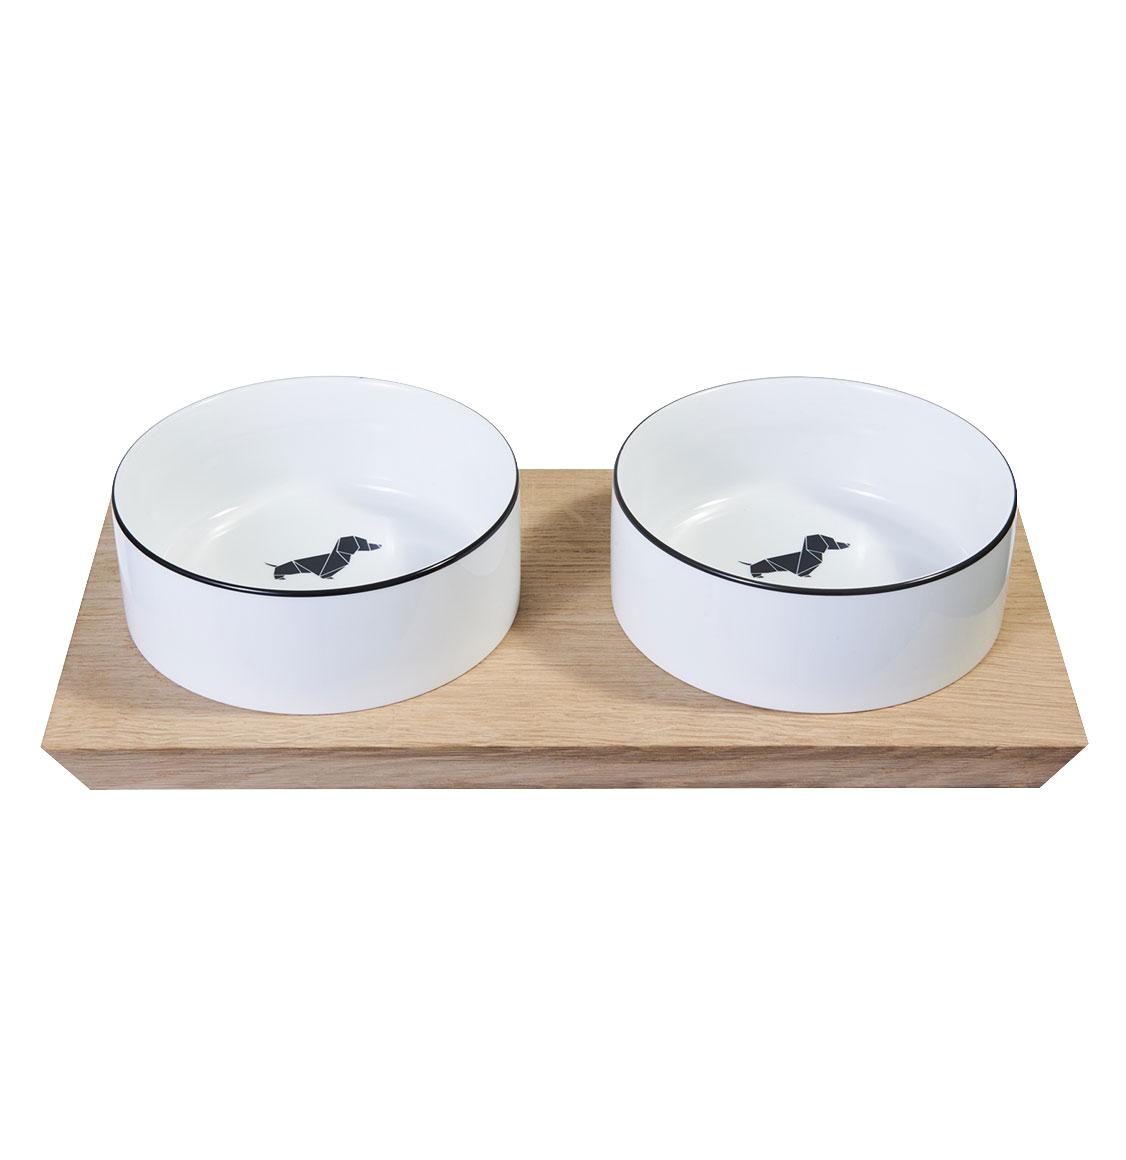 Poldo Dog Couture Double Bowls Set